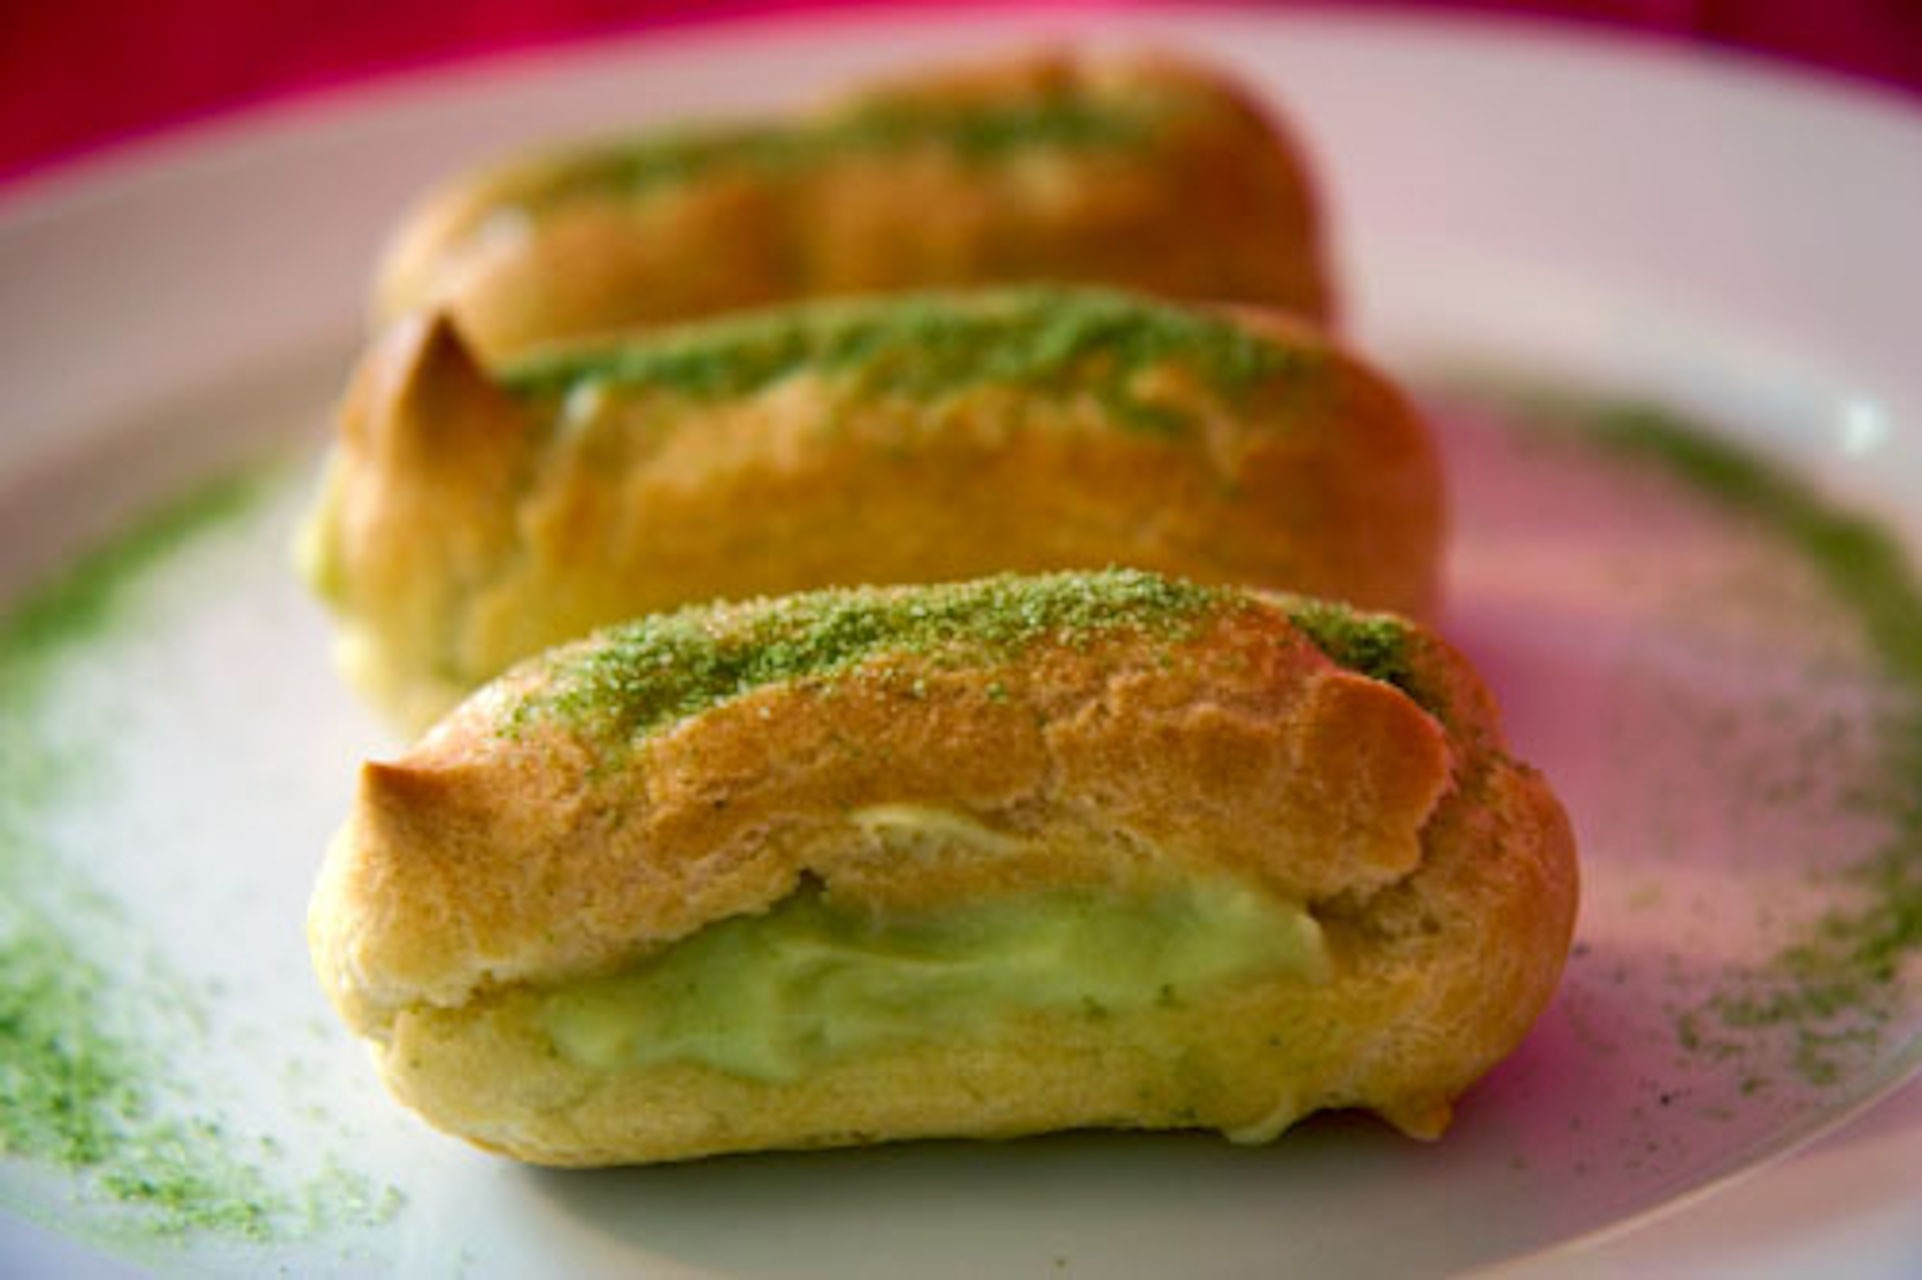 Green tea eclairs